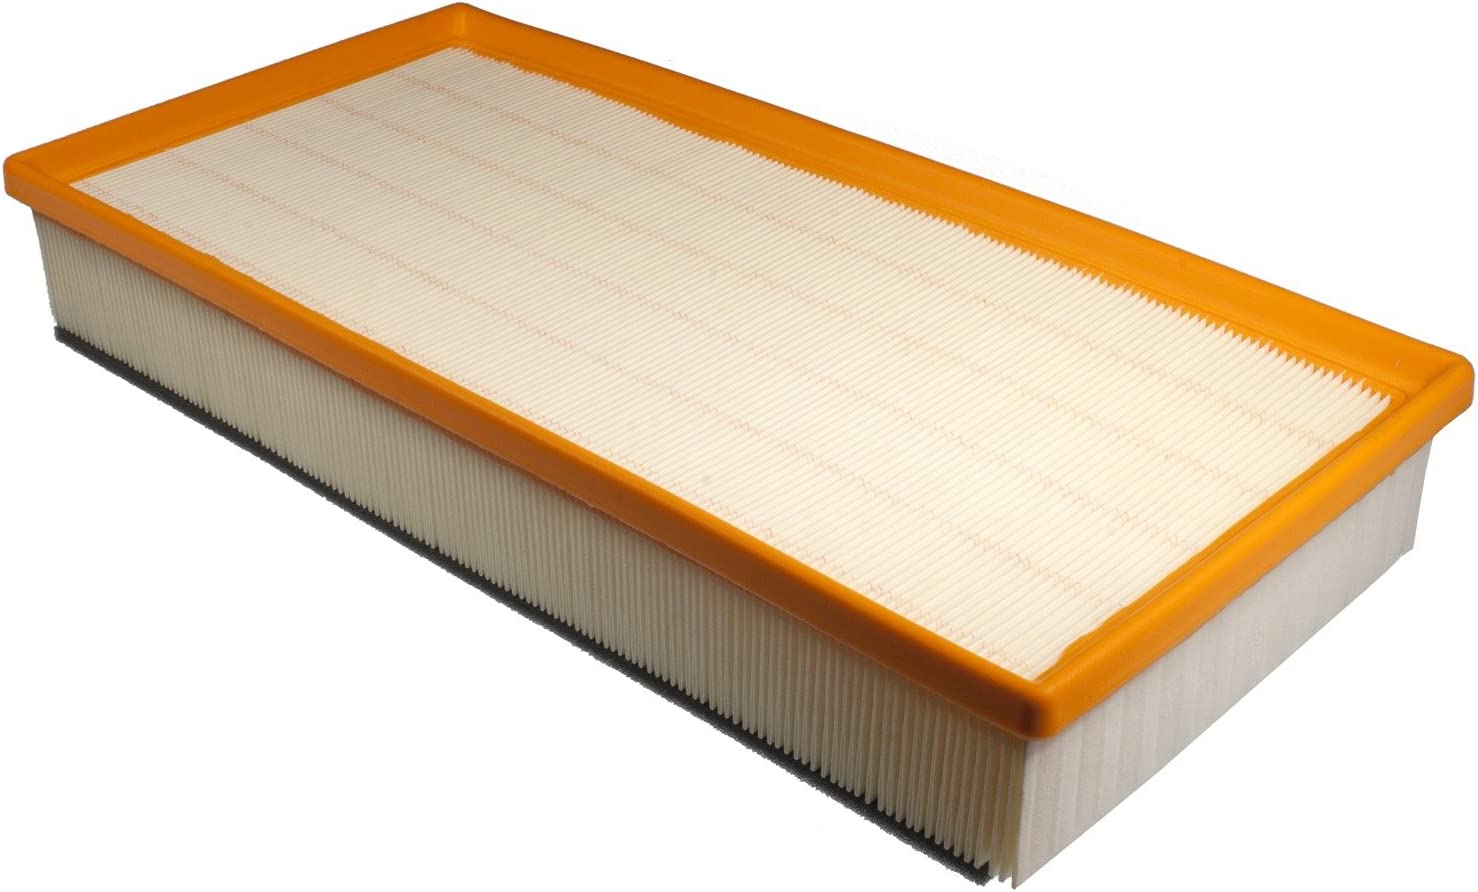 NEW Mahle Air Filter 090 54037 057 Air Filter NEW